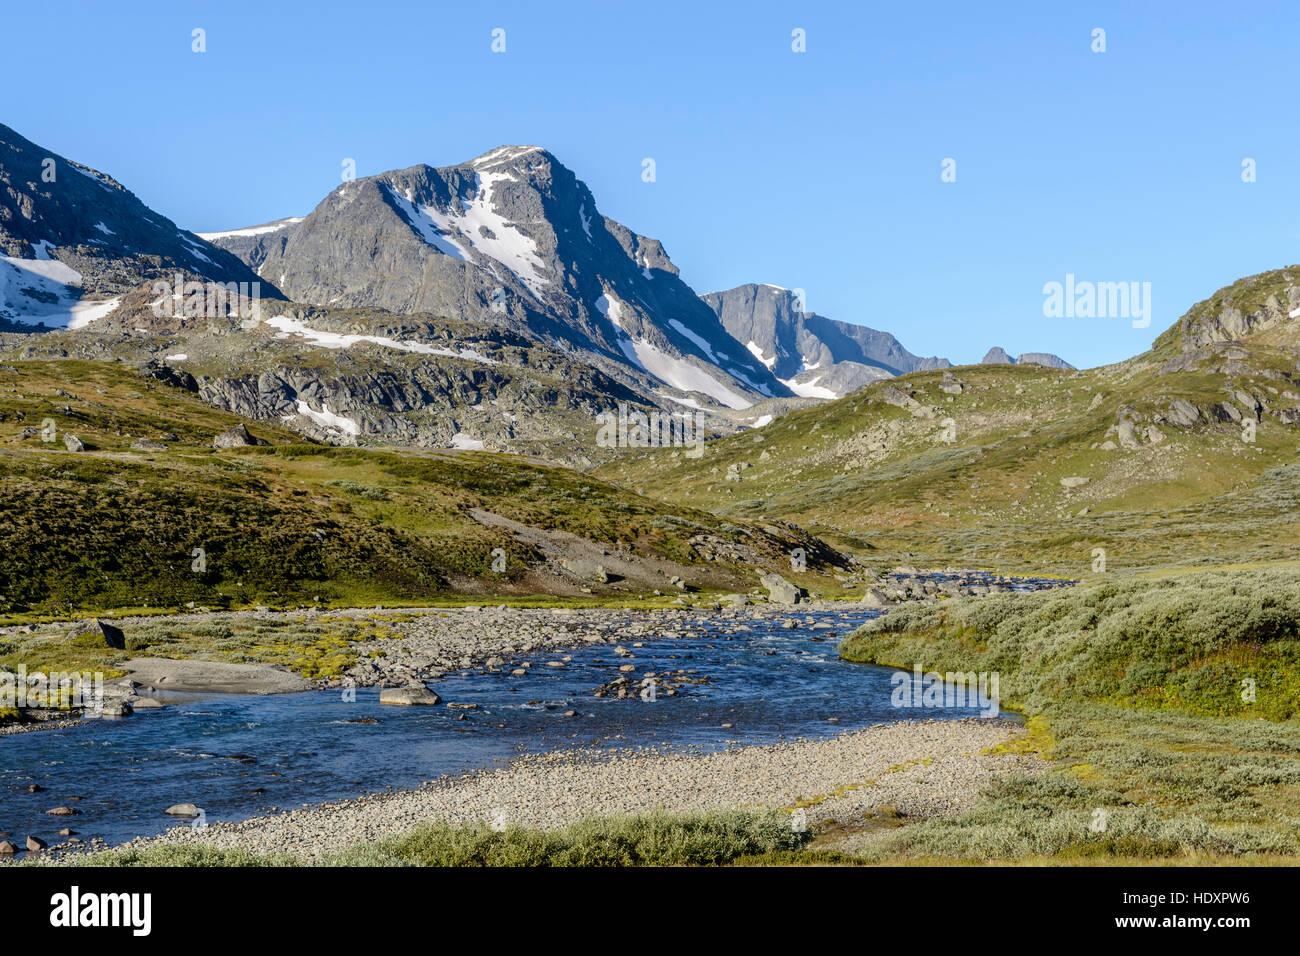 River in Leirungsdalen, Jotunheimen National Park, Norway - Stock Image